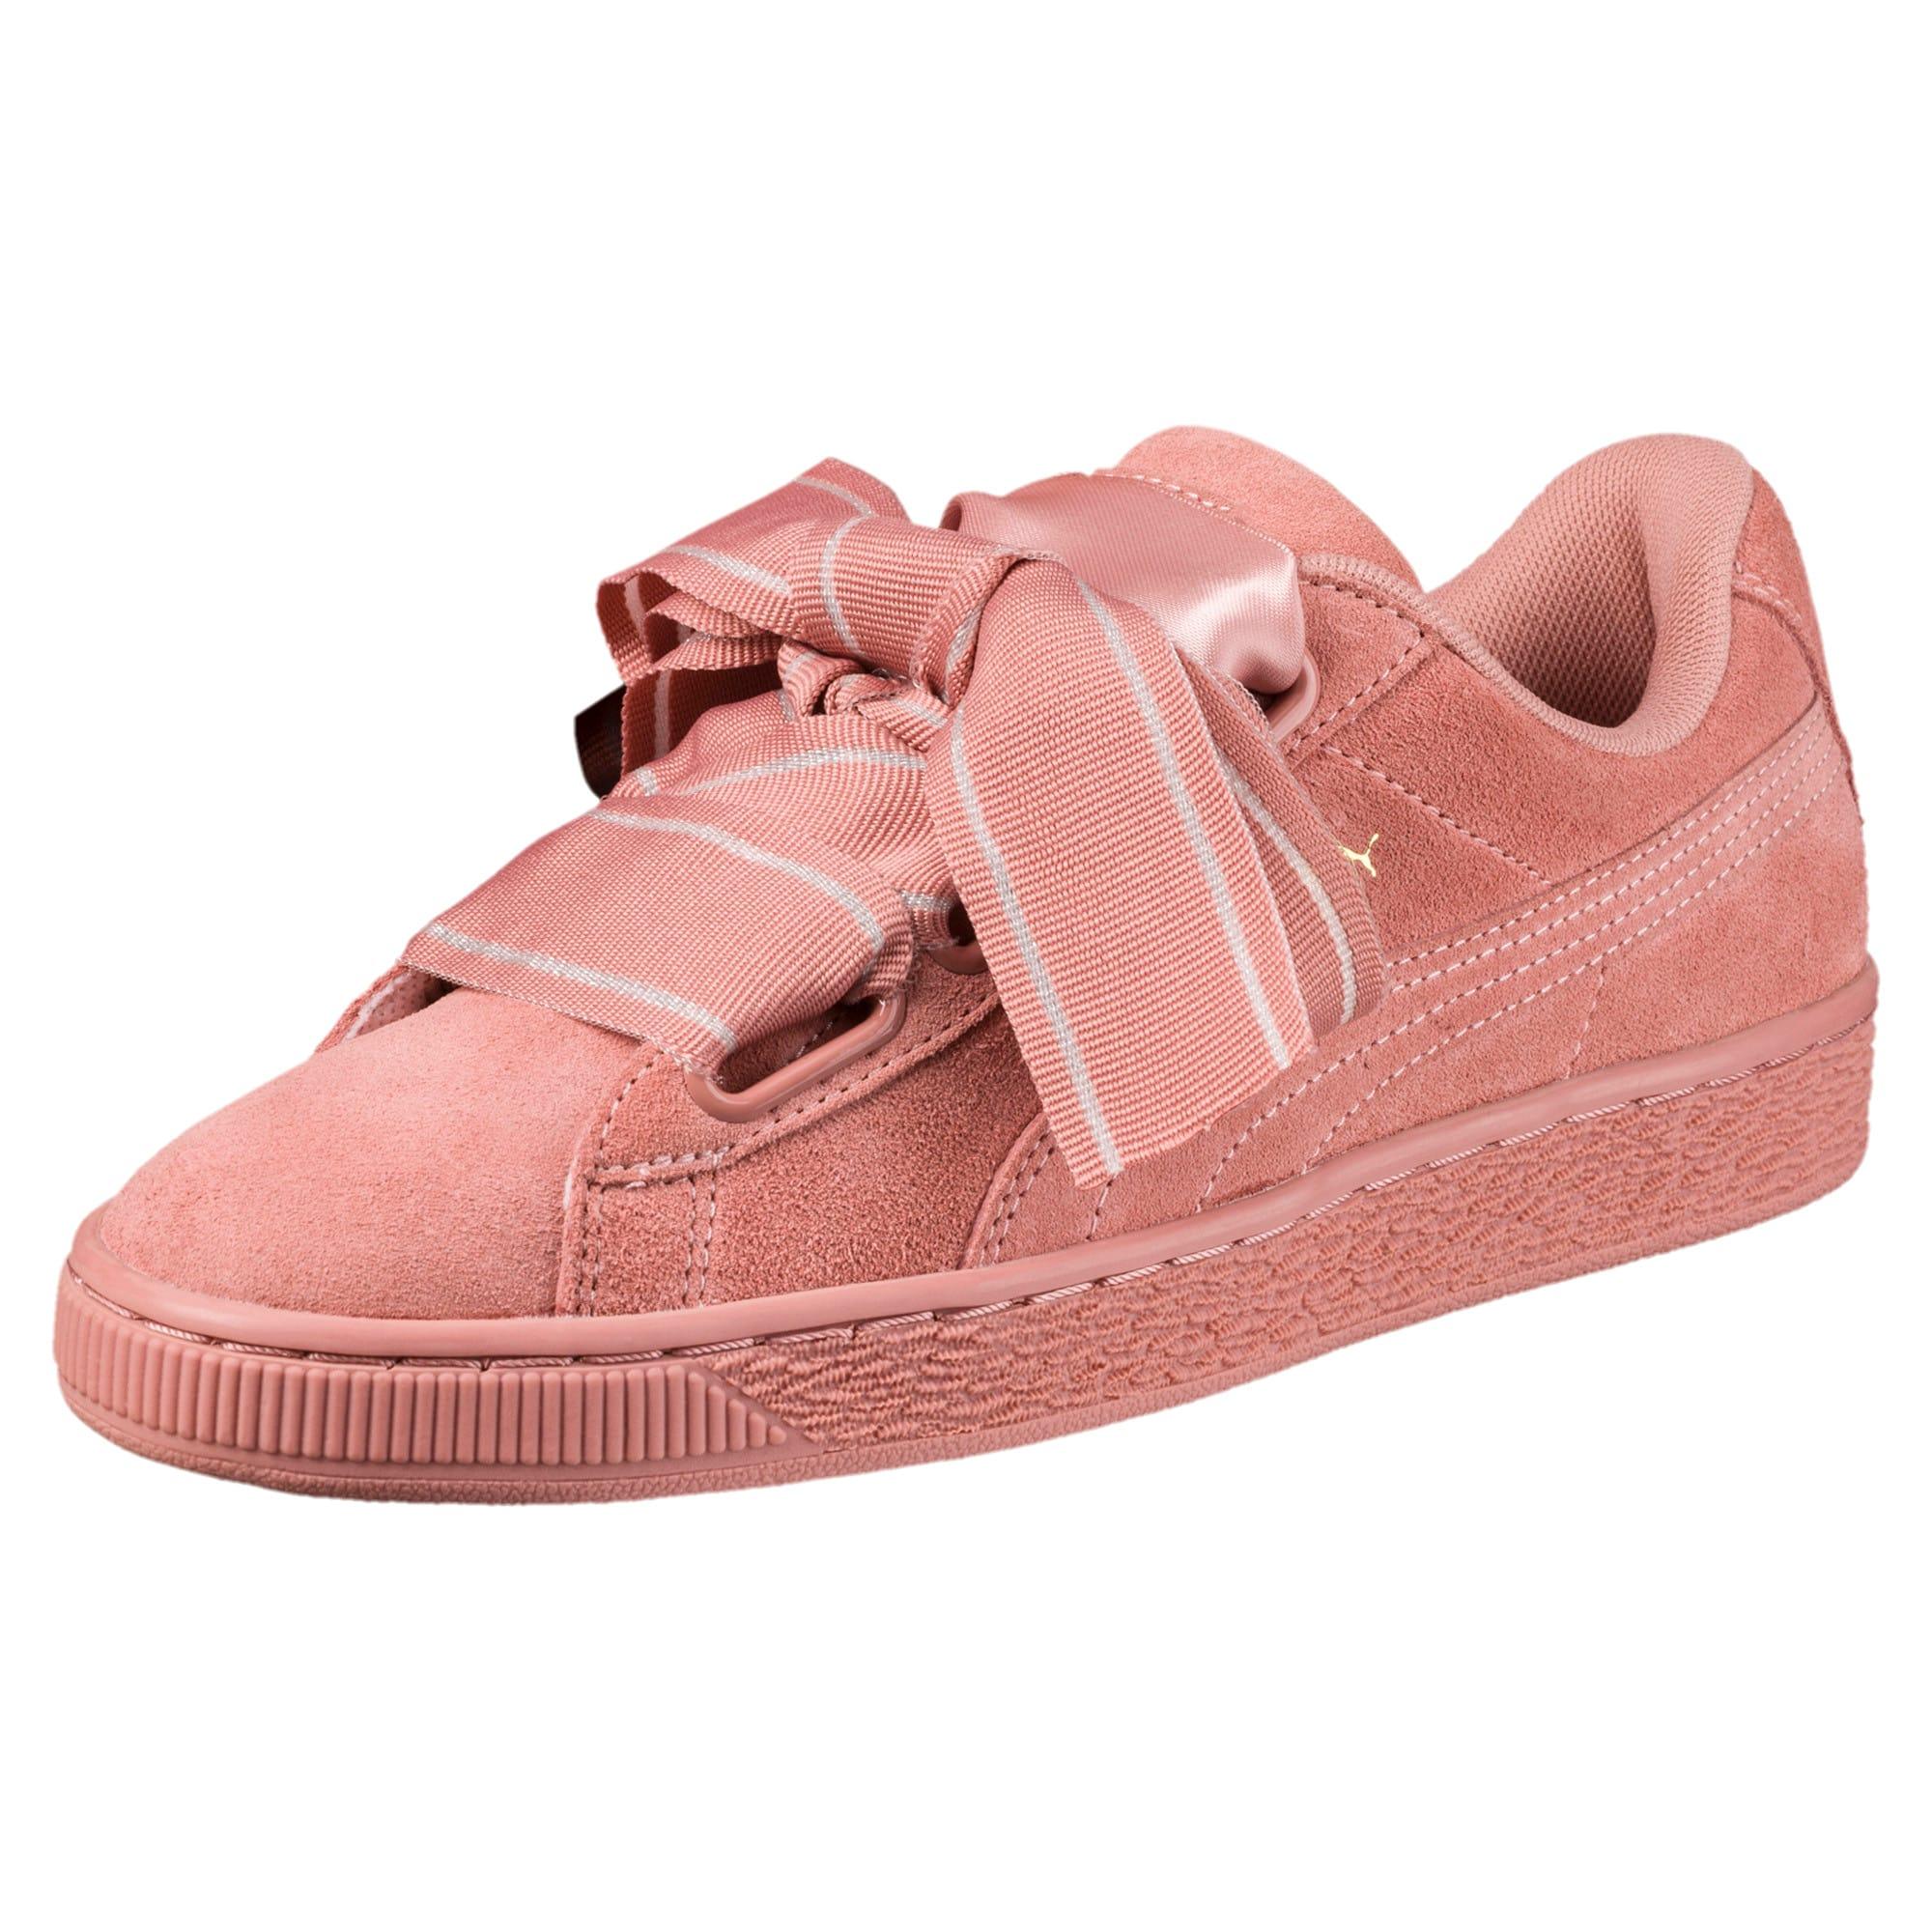 Thumbnail 1 of Suede Heart Satin II Women's Sneakers, Cameo Brown-Cameo Brown, medium